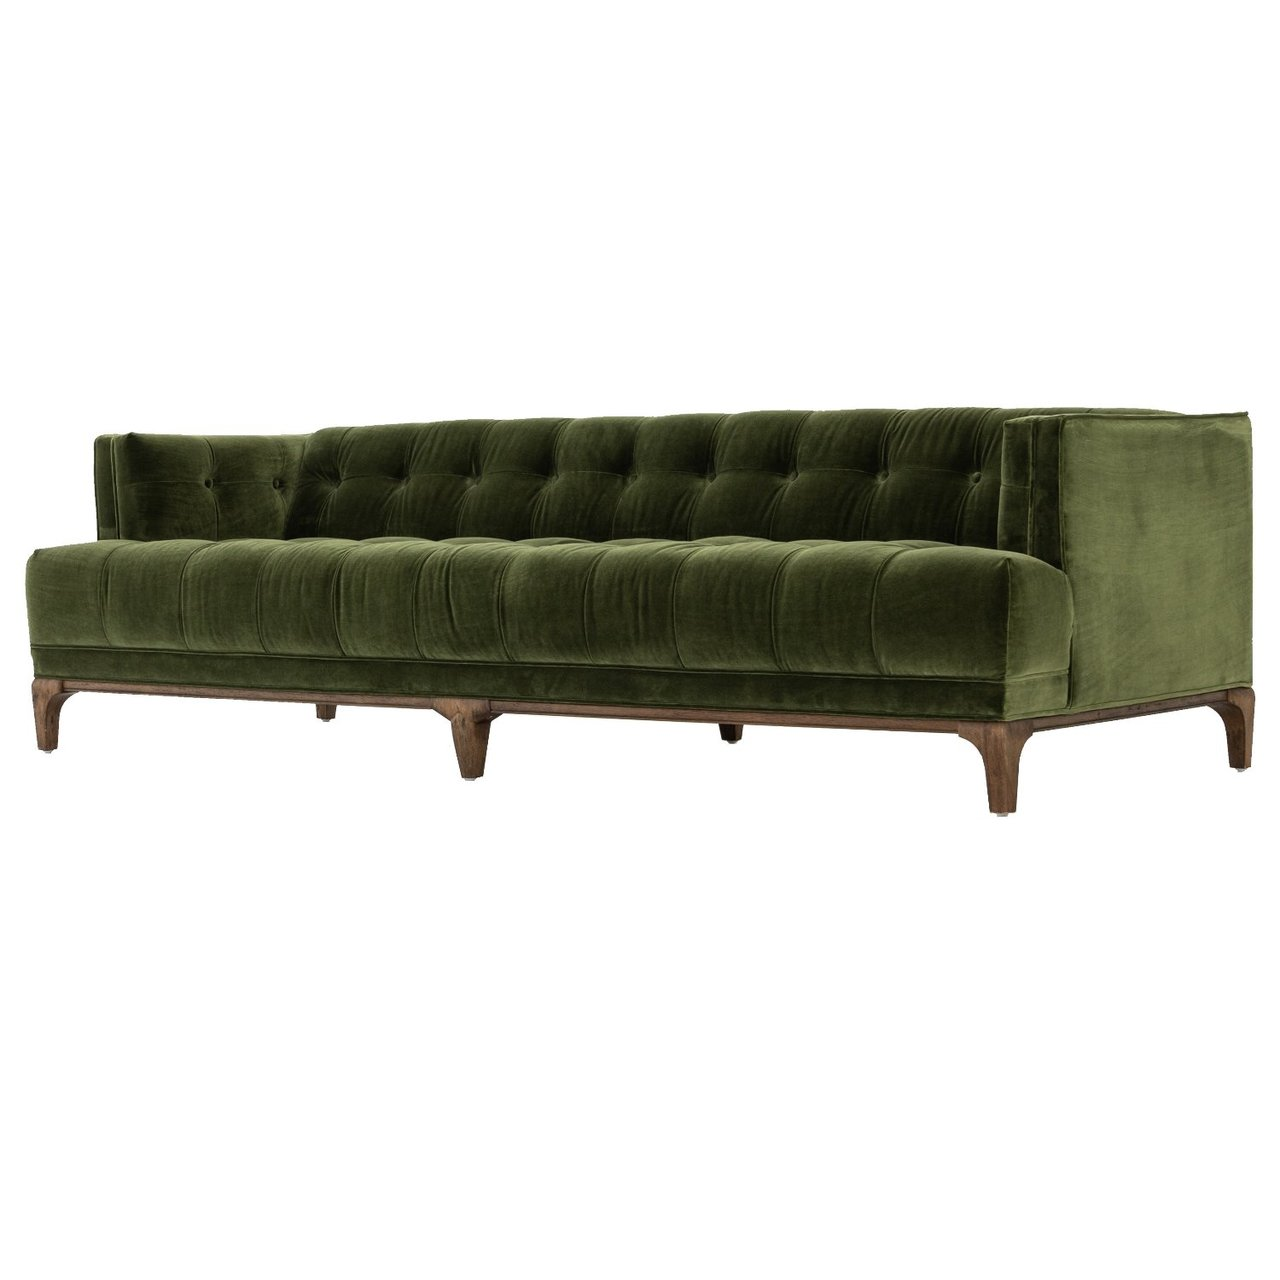 Dylan Mid Century Modern Olive Green Velvet Tufted Sofa Zin Home Fourhands